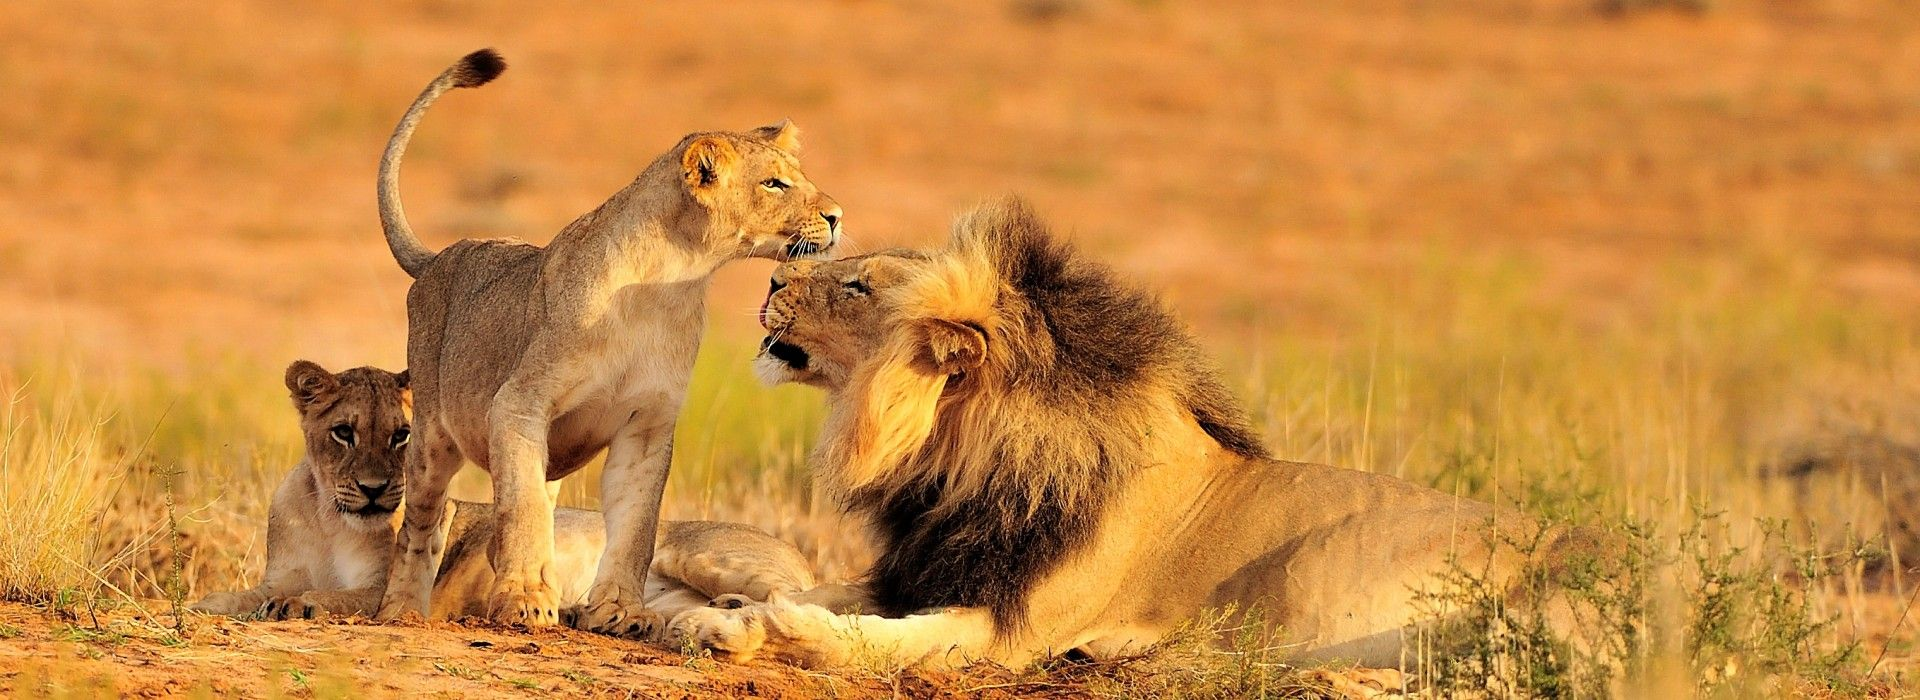 Wildlife, landscapes and nature Tours in Port Elizabeth